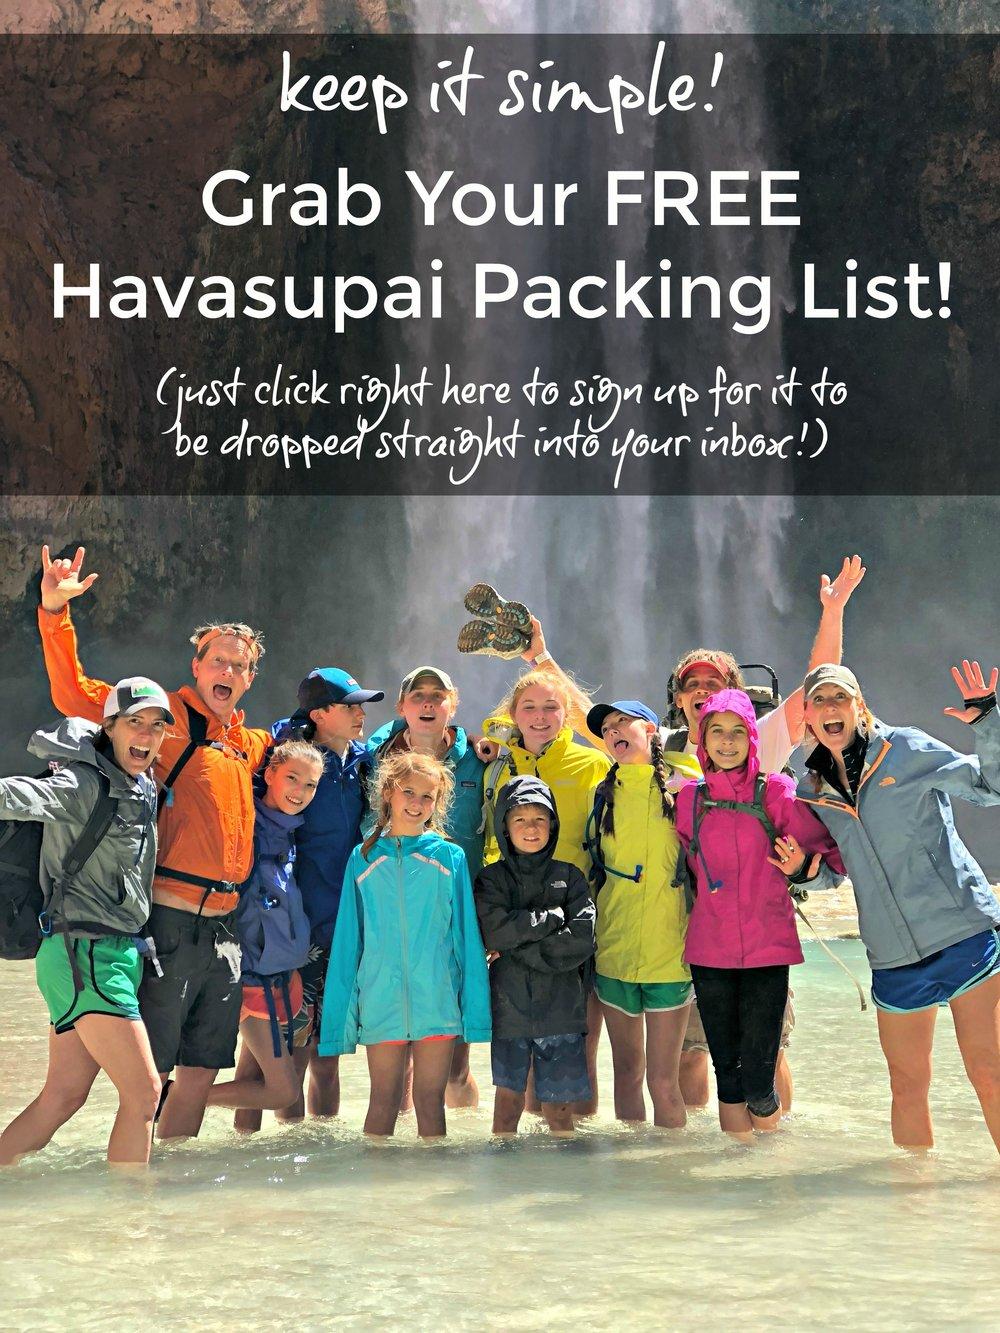 Free Havasupai camping packing list